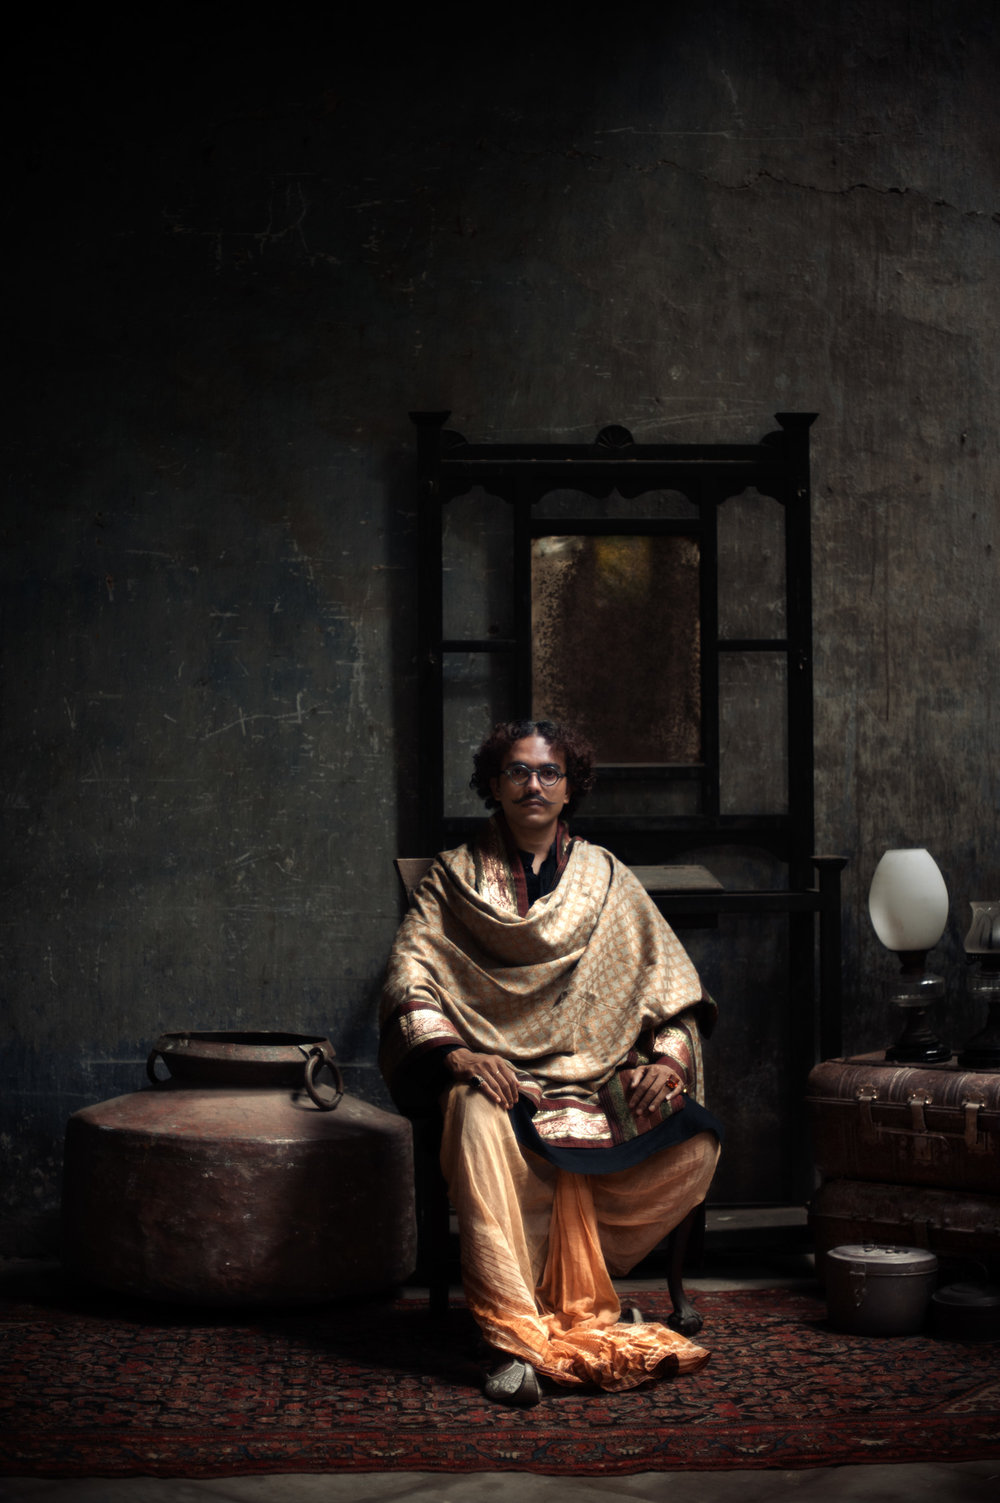 1_Chhandak Pradhan-fashion-Ruins and a Requiem-vintage_feudal_Indian_royal_portrait.jpg